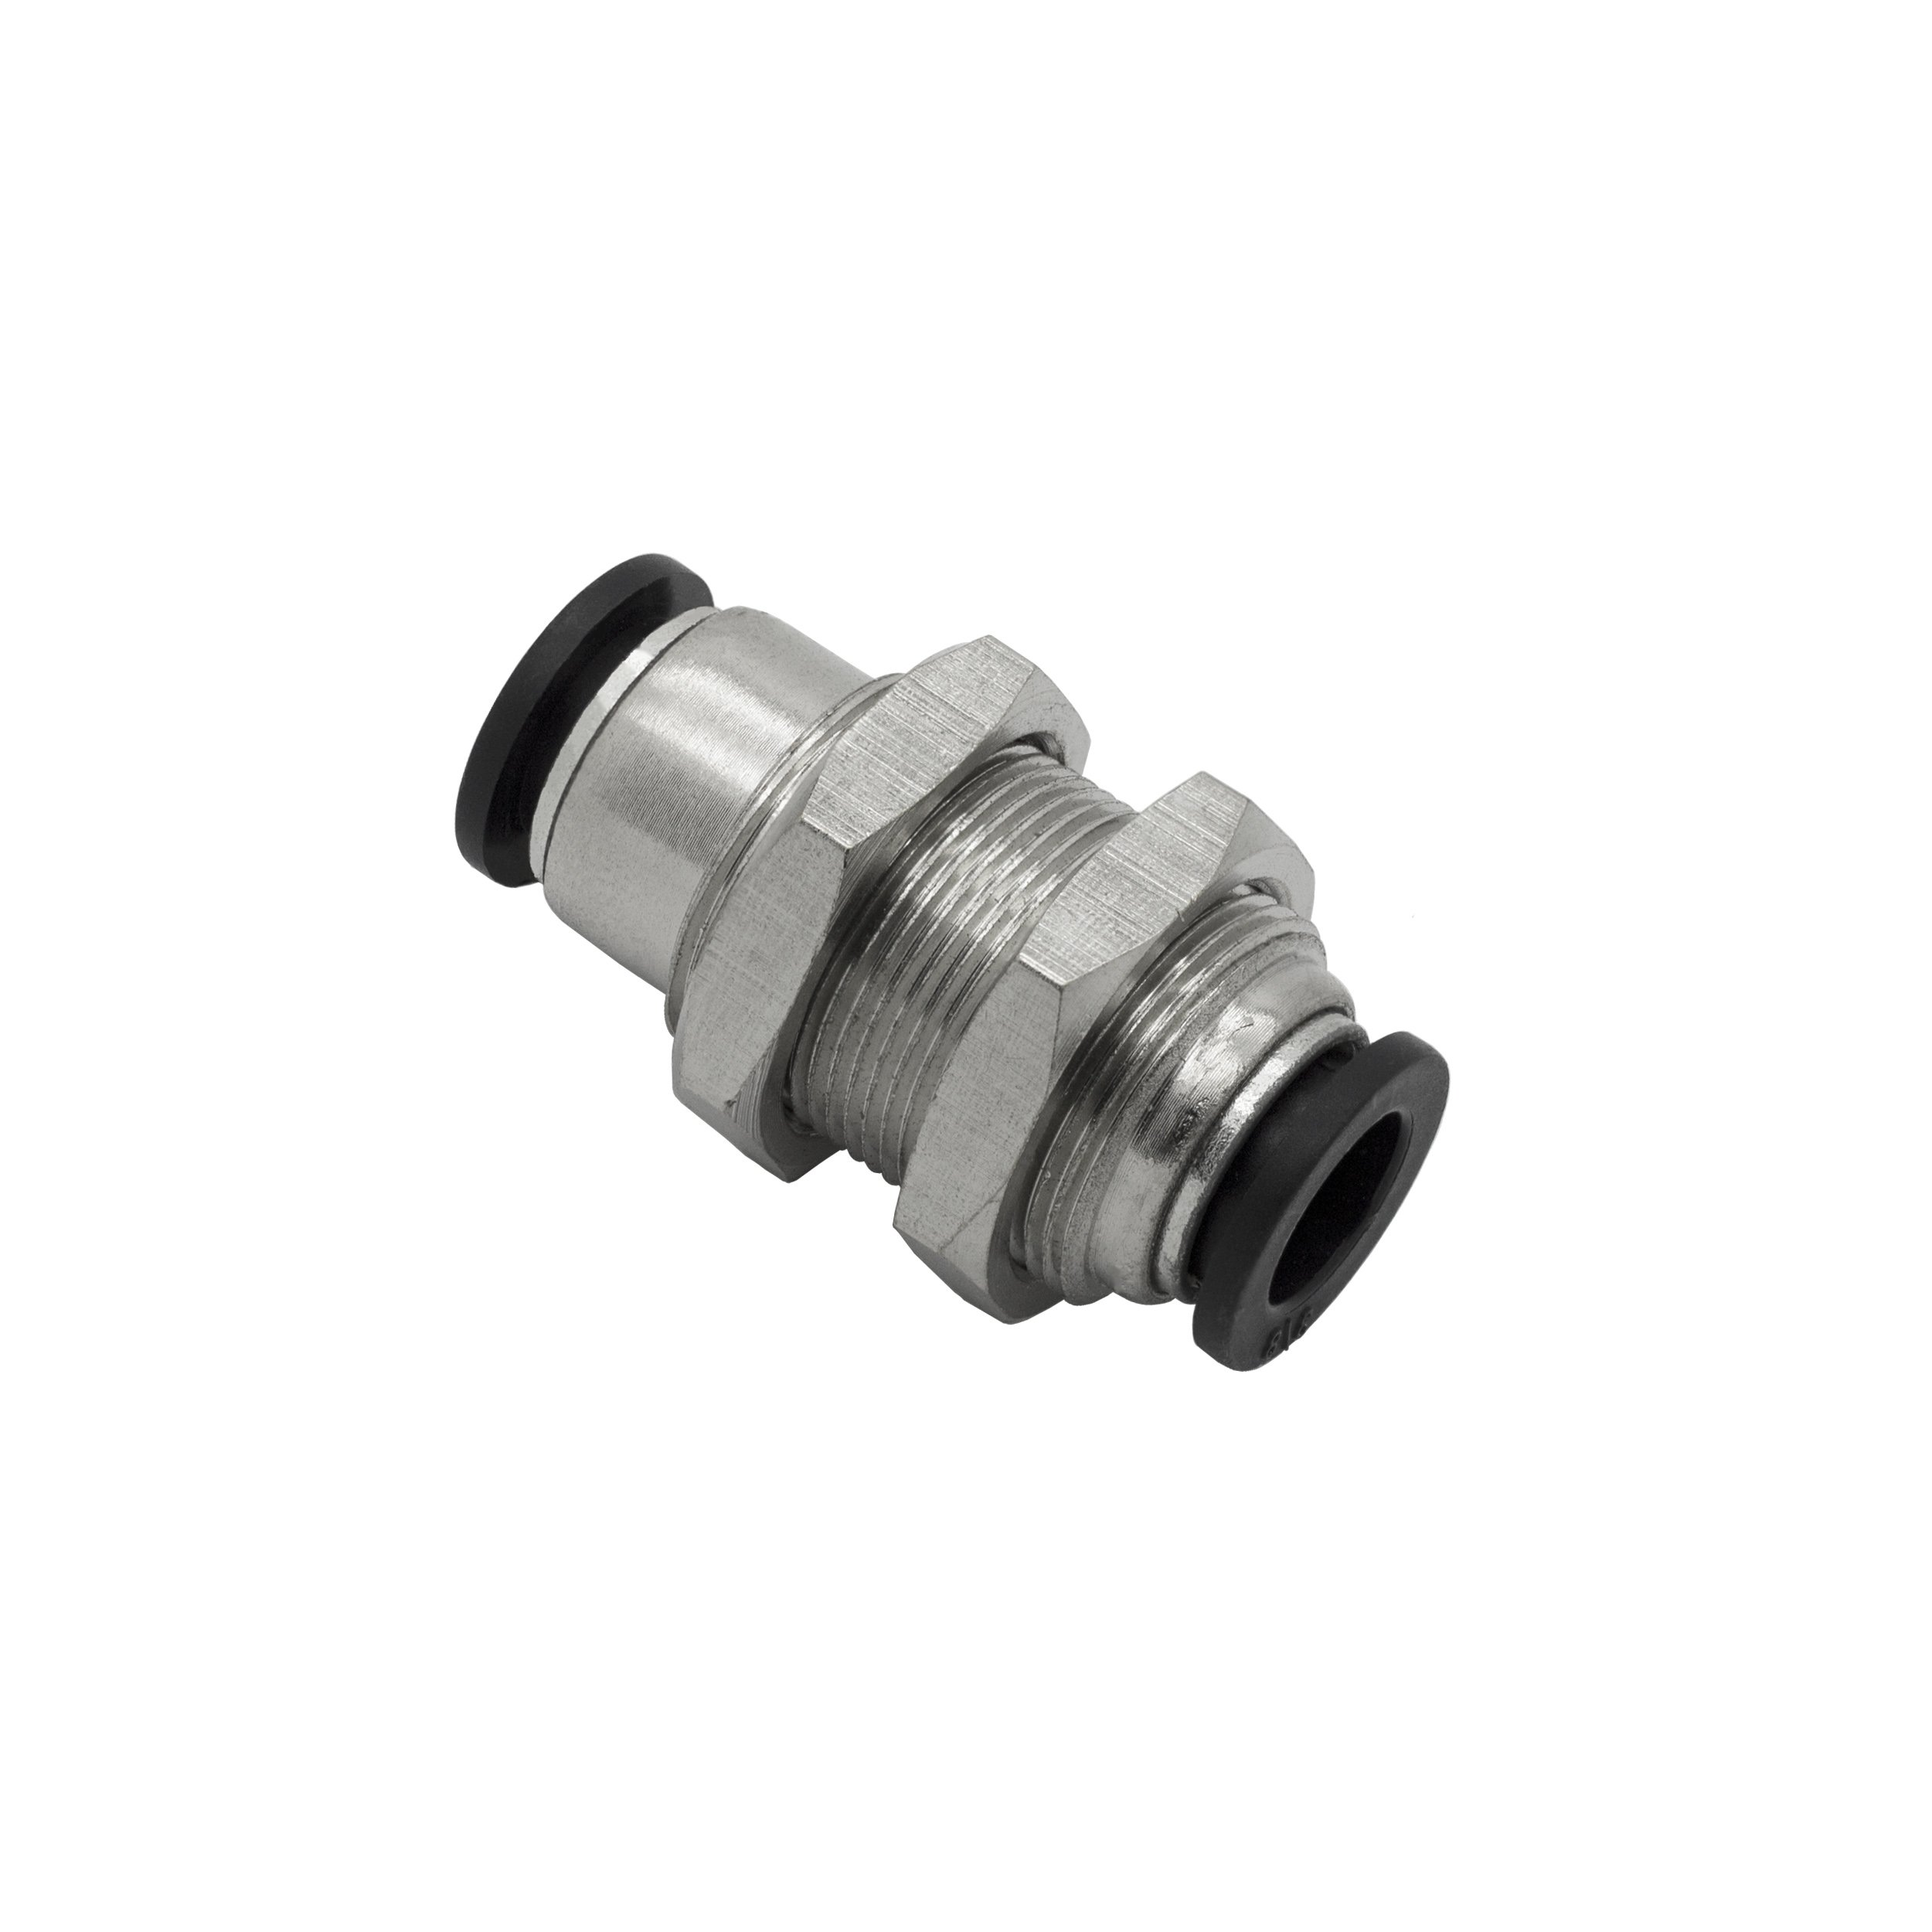 PneumaticPlus PMM-3/8 Push to Connect Tube Fitting, Bulkhead Union - 3/8'' Tube OD x 3/8'' Tube OD (10 per pack)